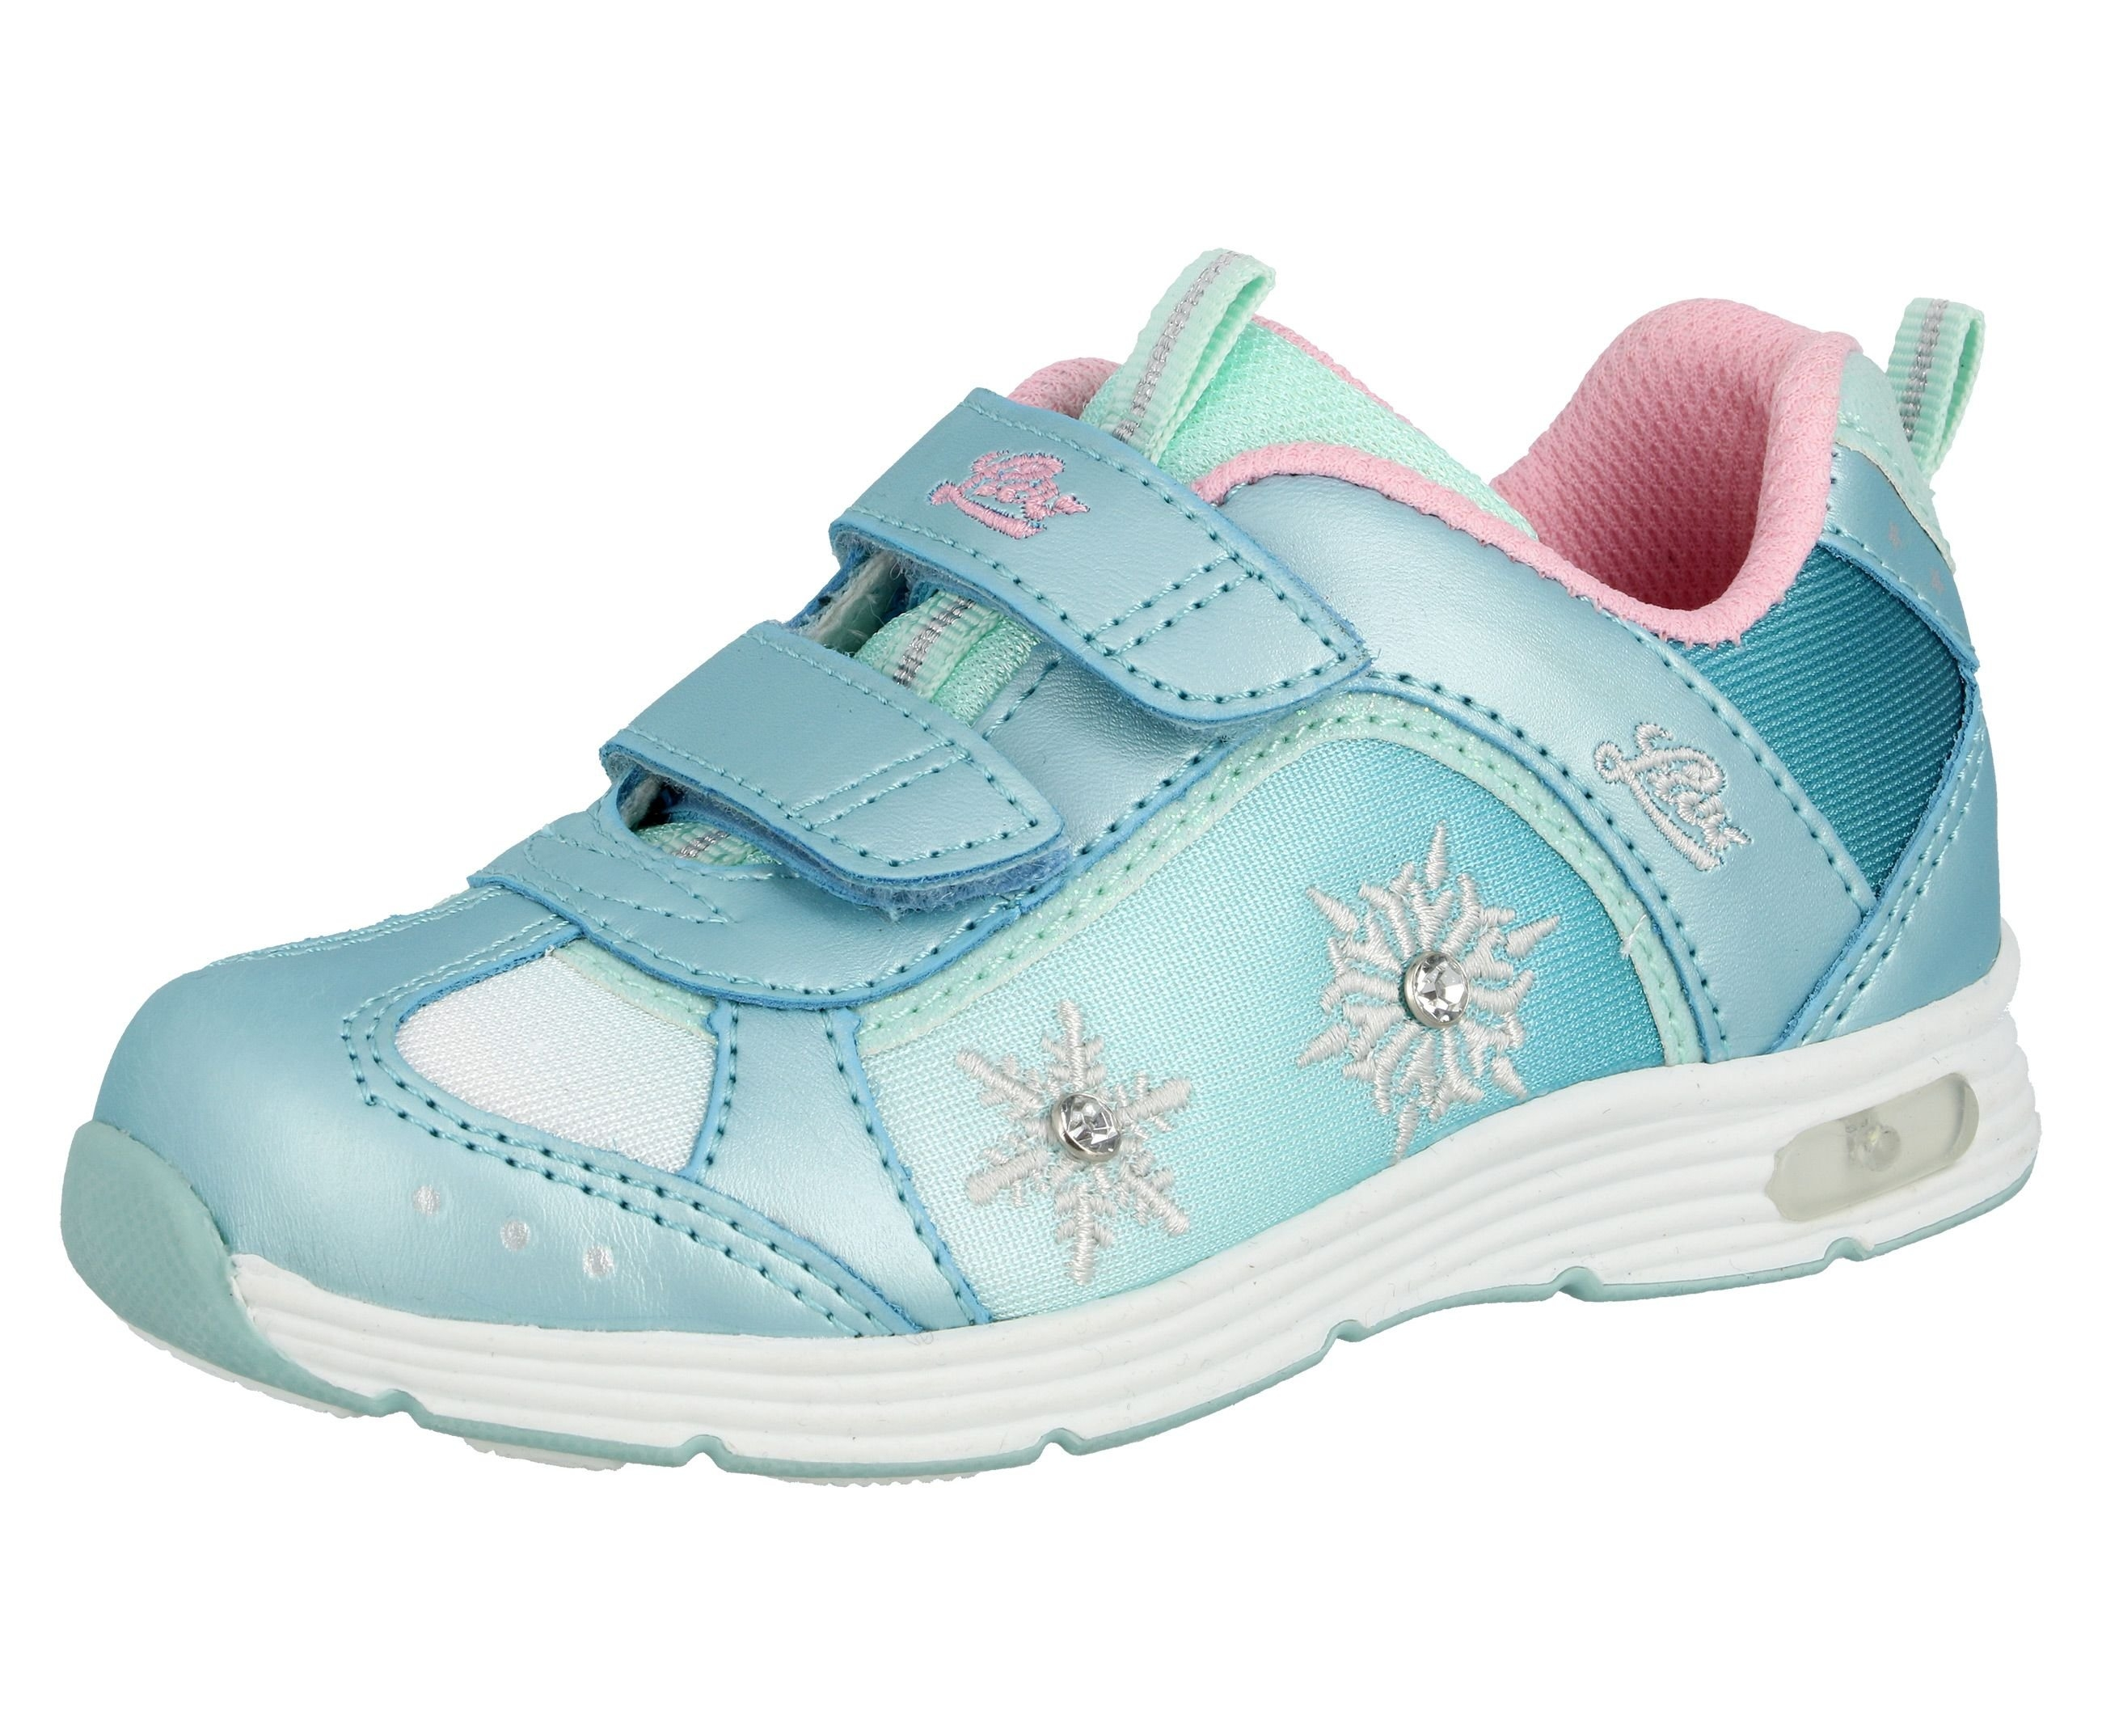 Lico sneakers »Freizeitschuh Snowflake V Blinky« veilig op otto.nl kopen